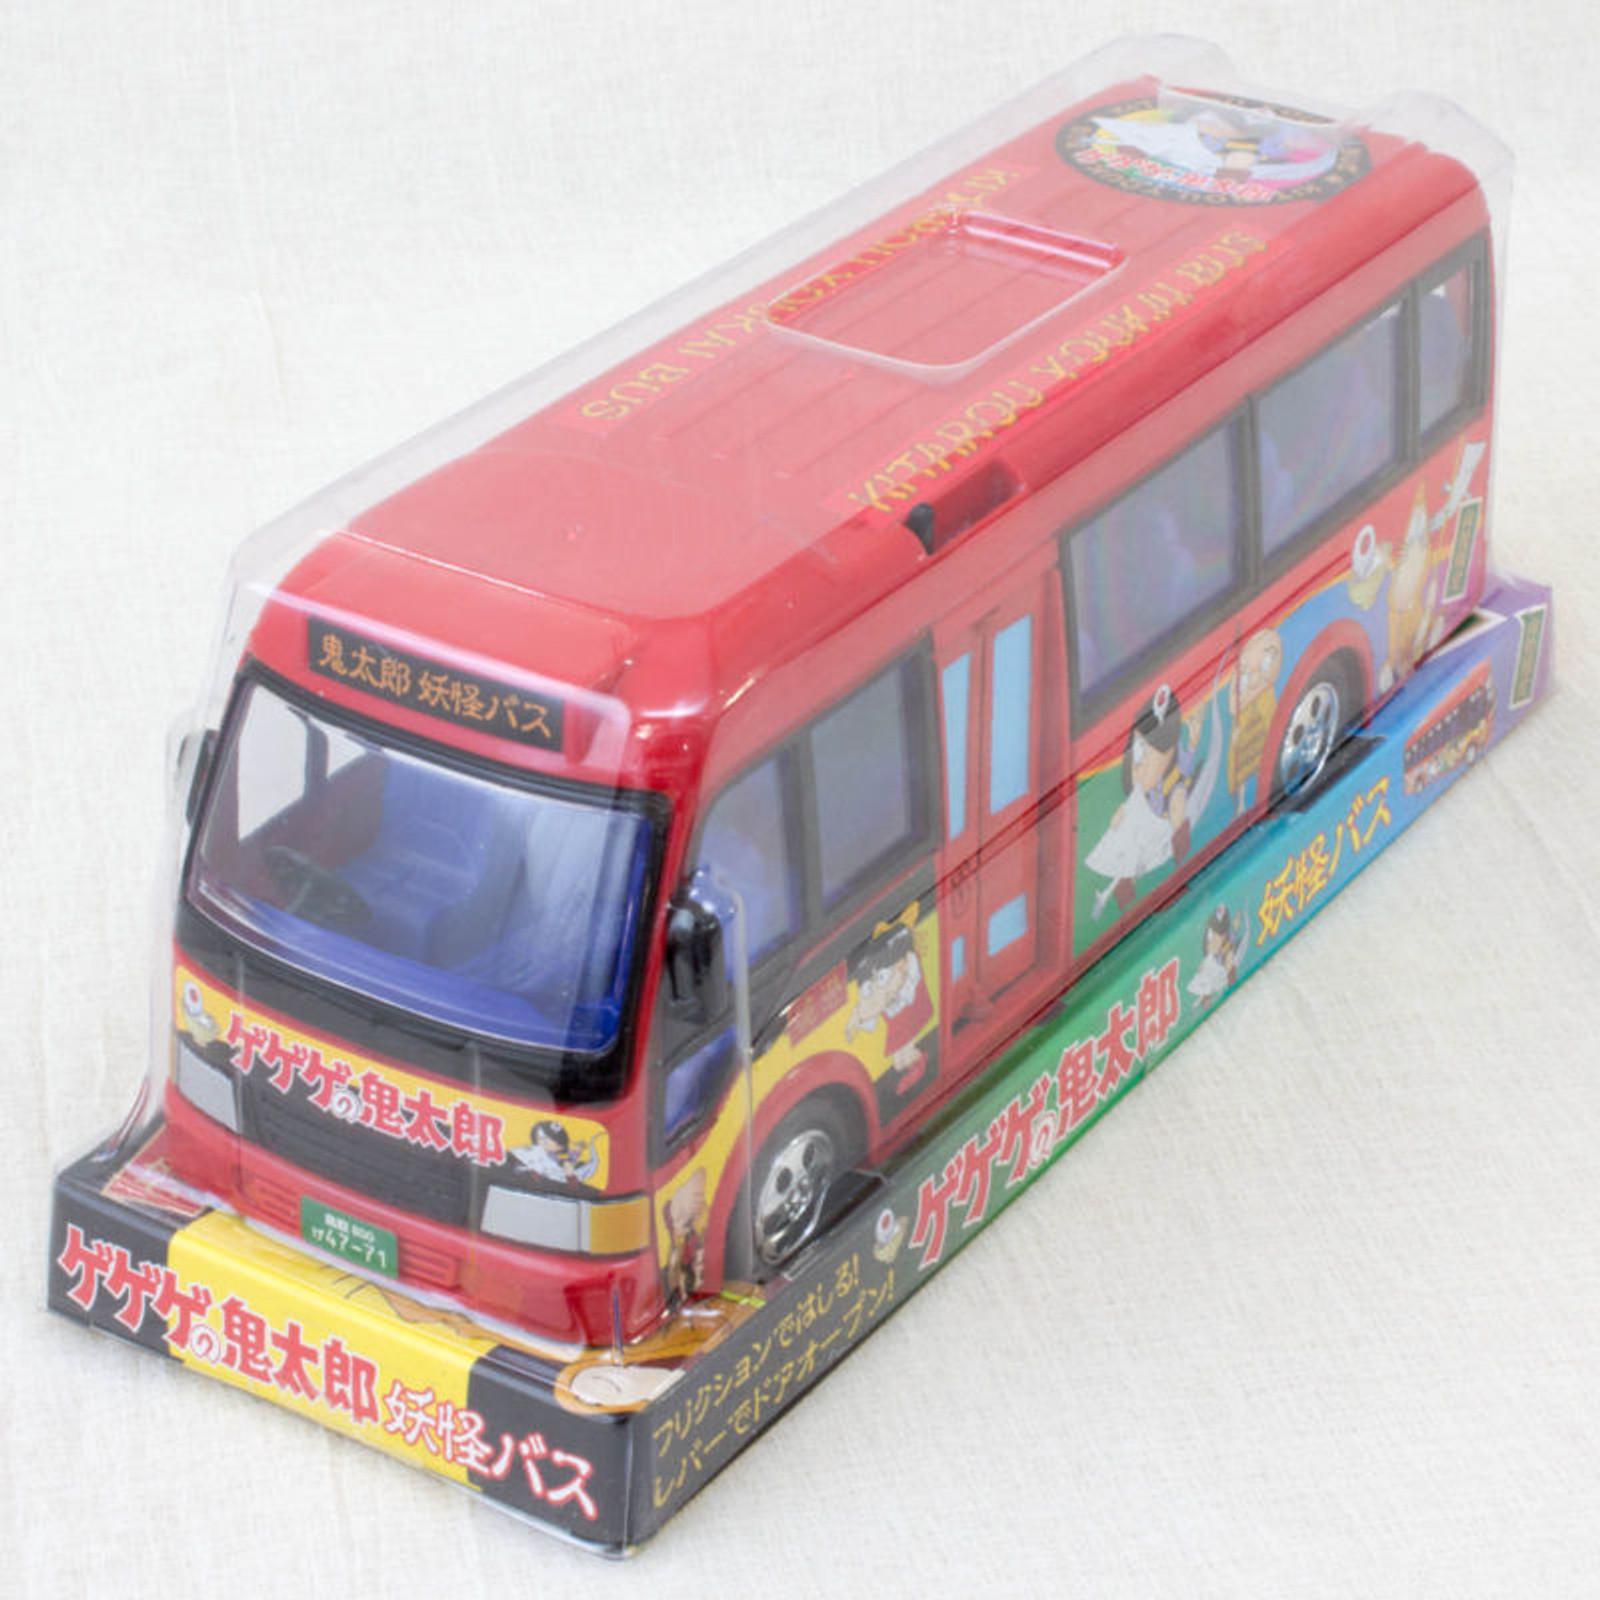 RARE! Gegege no Kitaro Yokai Bus Friction Toy Limited Sanin JAPAN ANIME MANGA